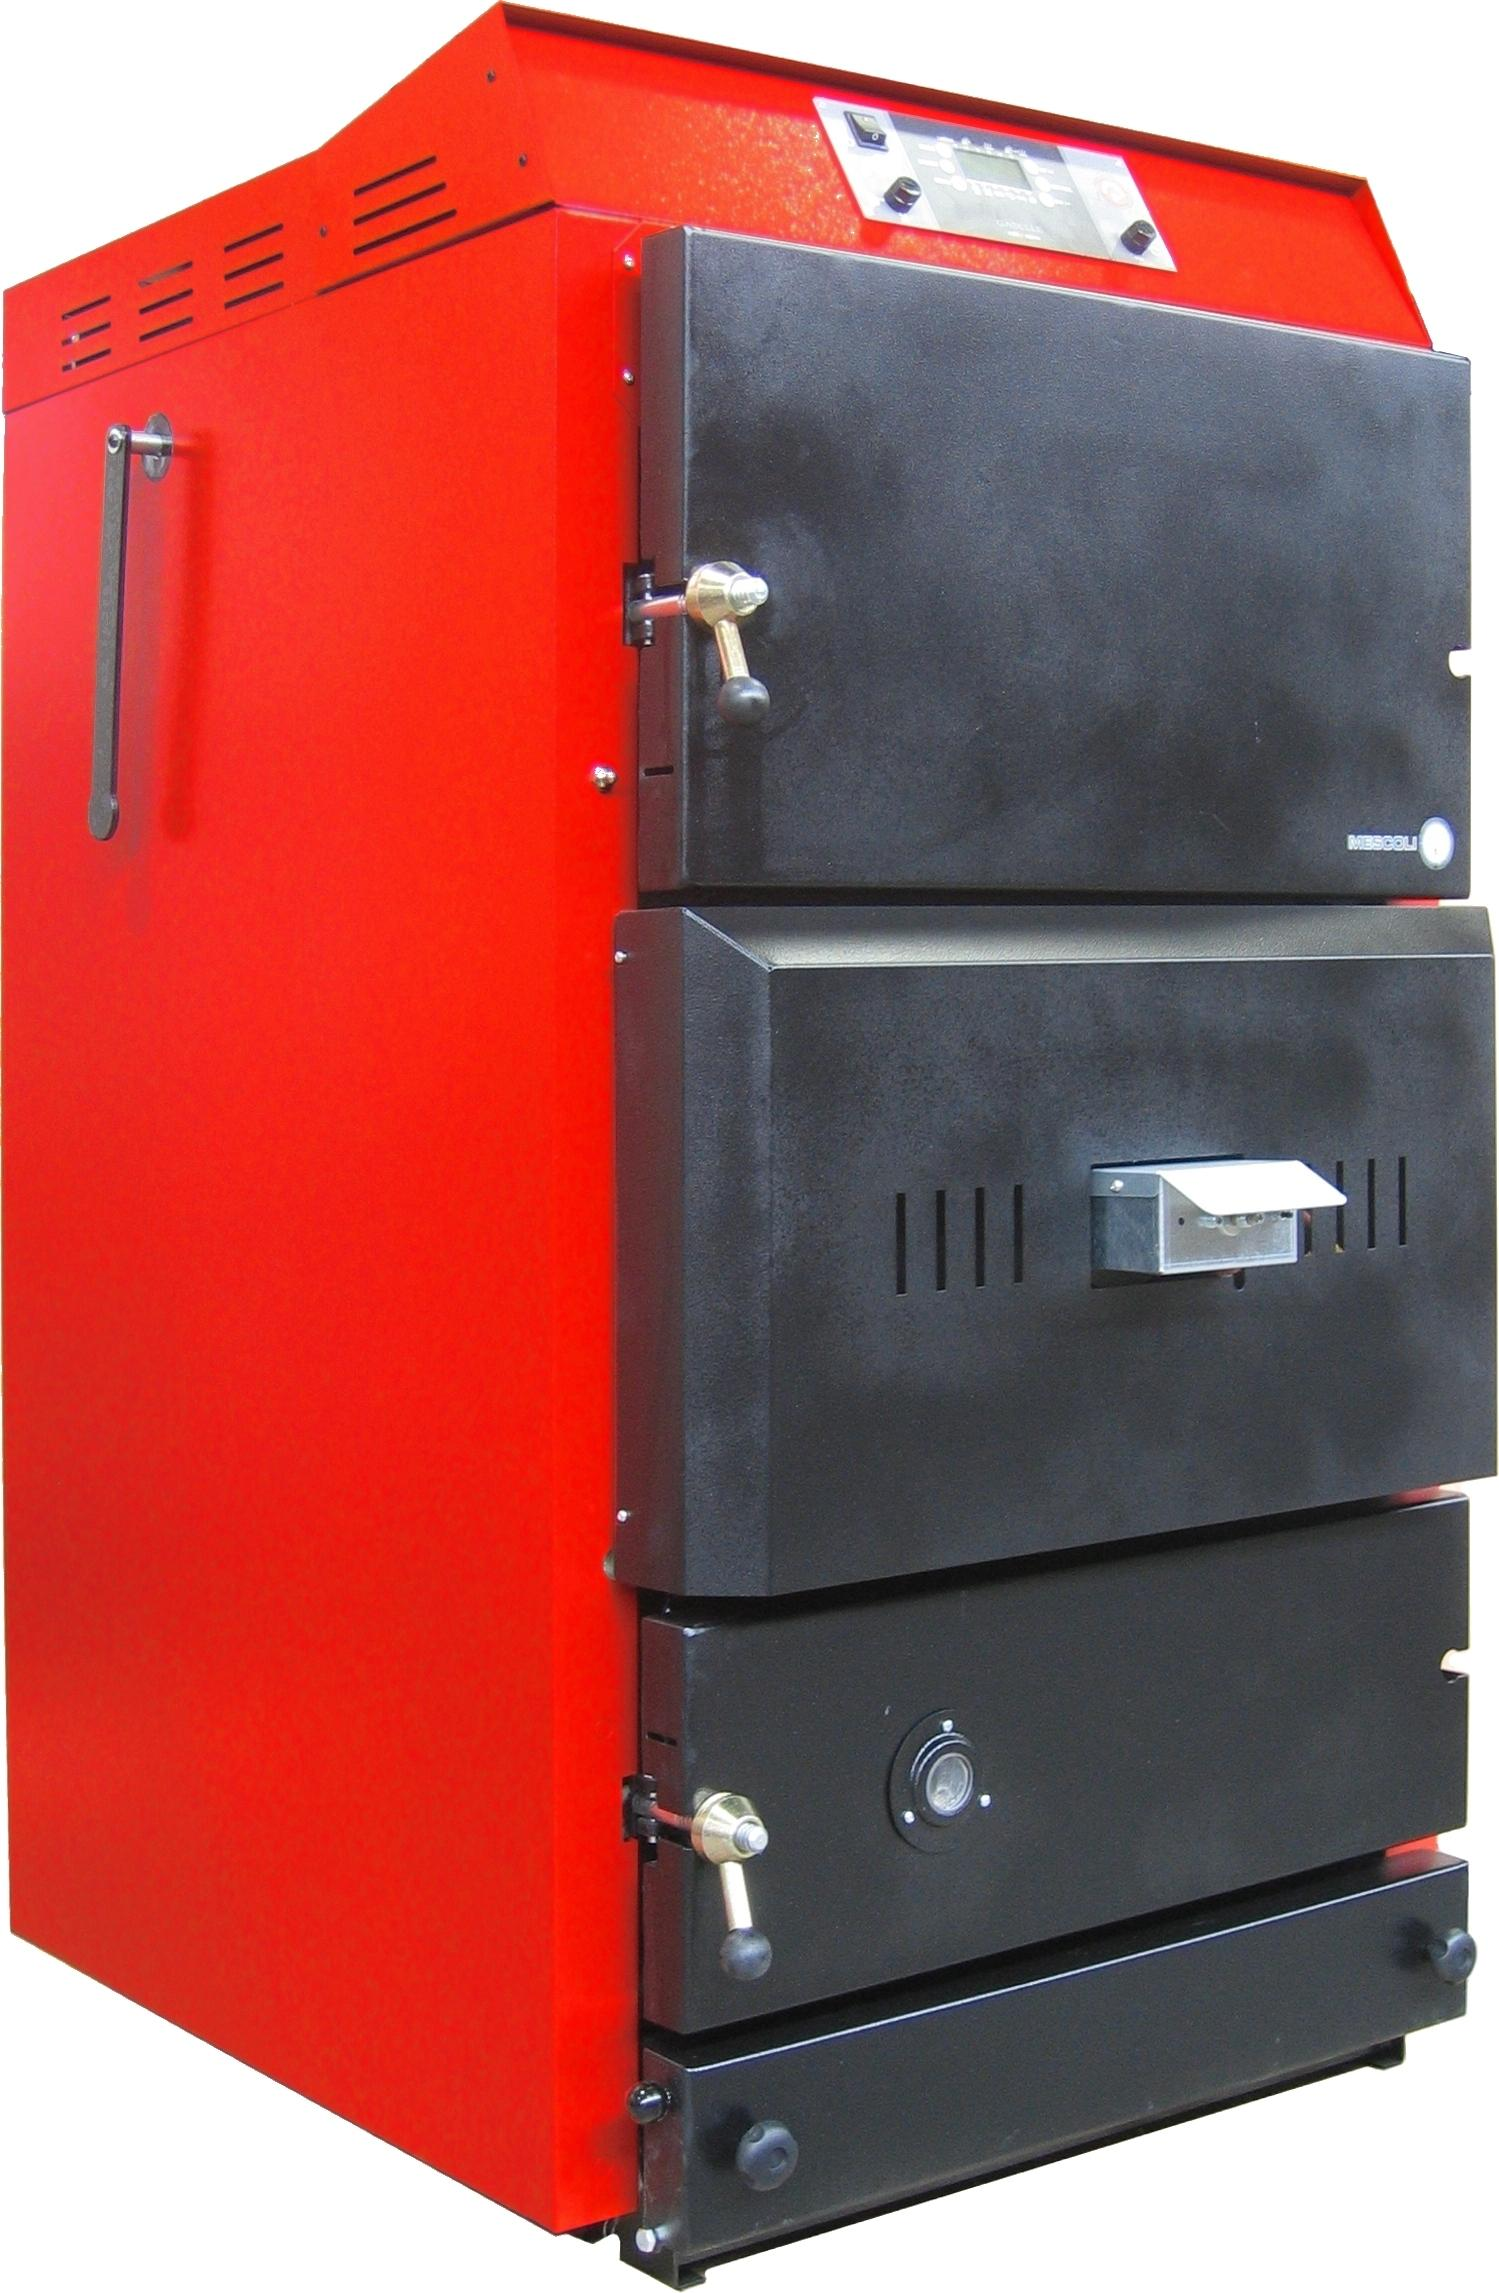 Gasification Wood Boiler For Sale